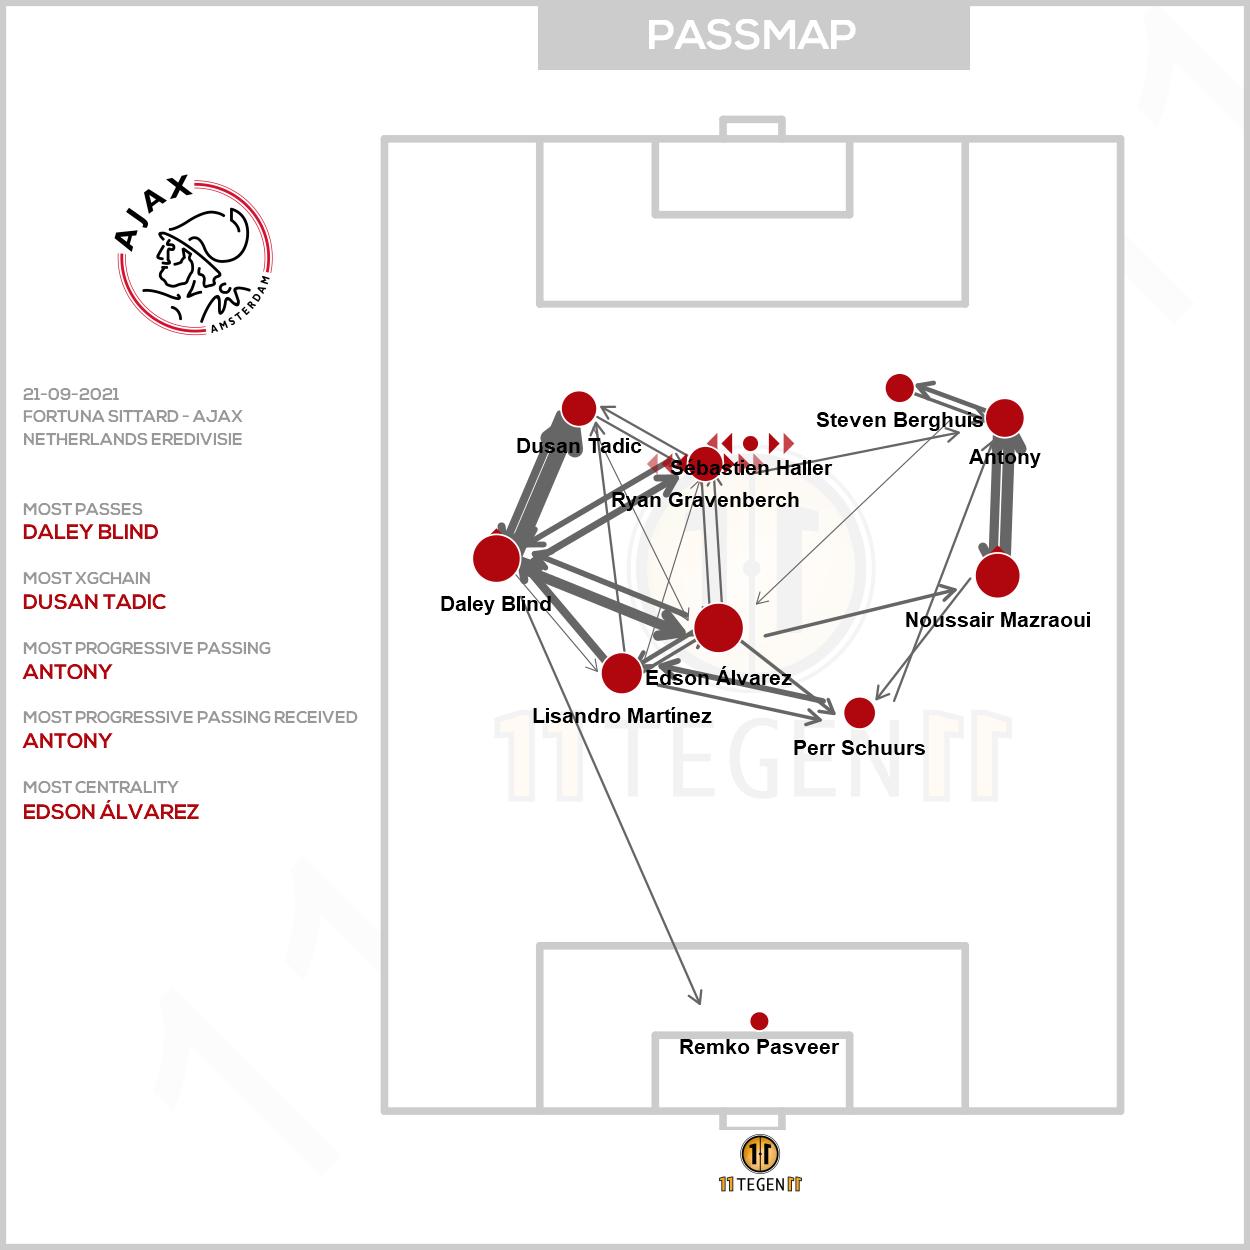 2021 09 21 Passmap Ajax Fortuna Sittard 0 5 Ajax